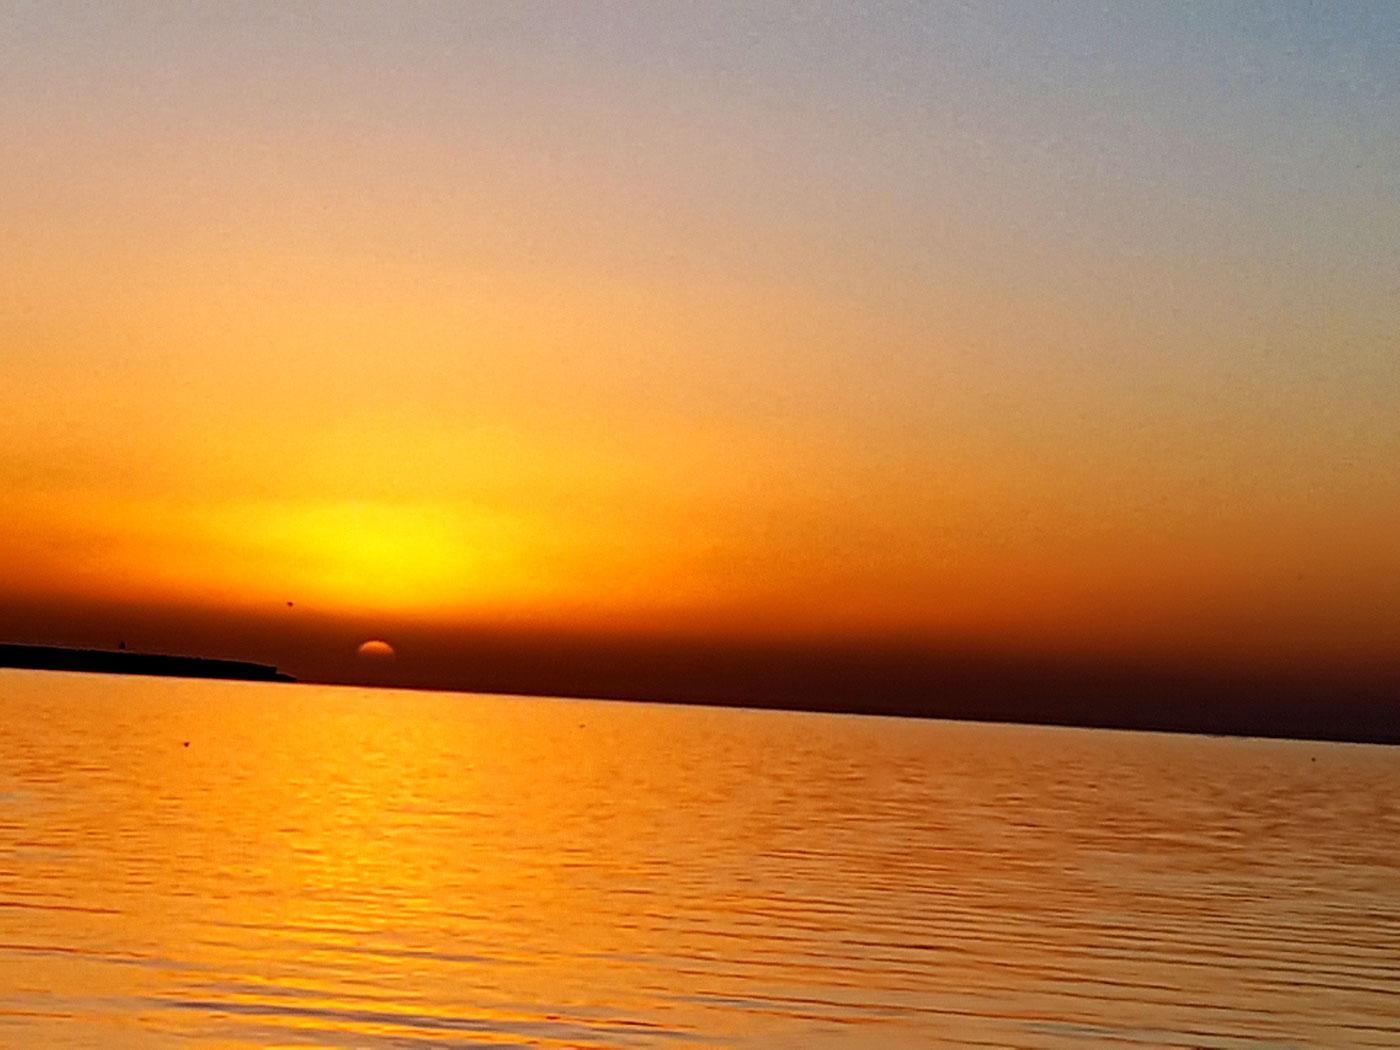 coucher-de-soleil-à-djerba-tunisie